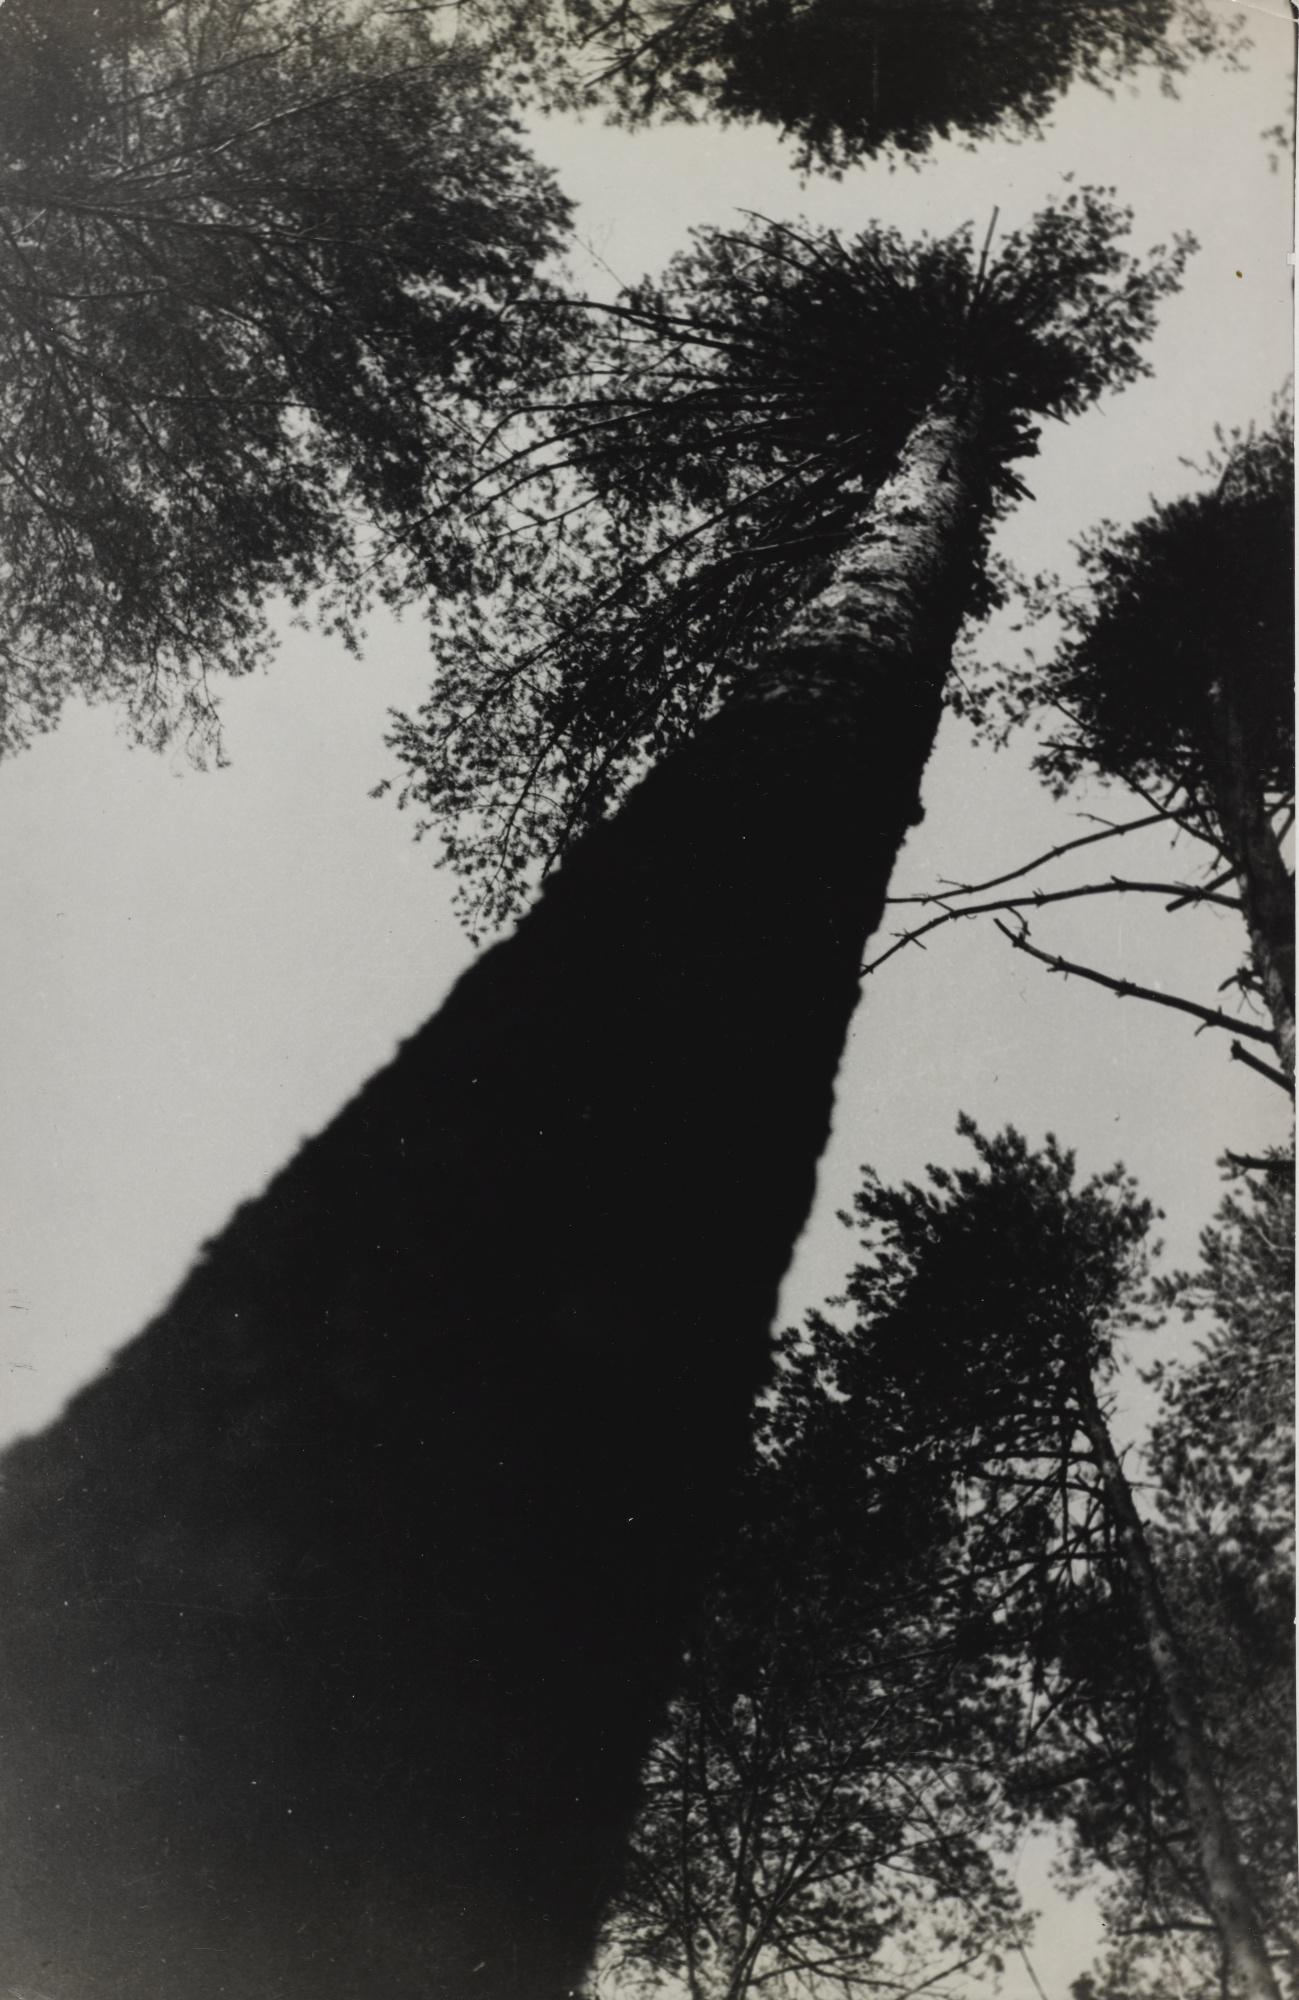 Alexander Rodchenko-Pine Trees-1927